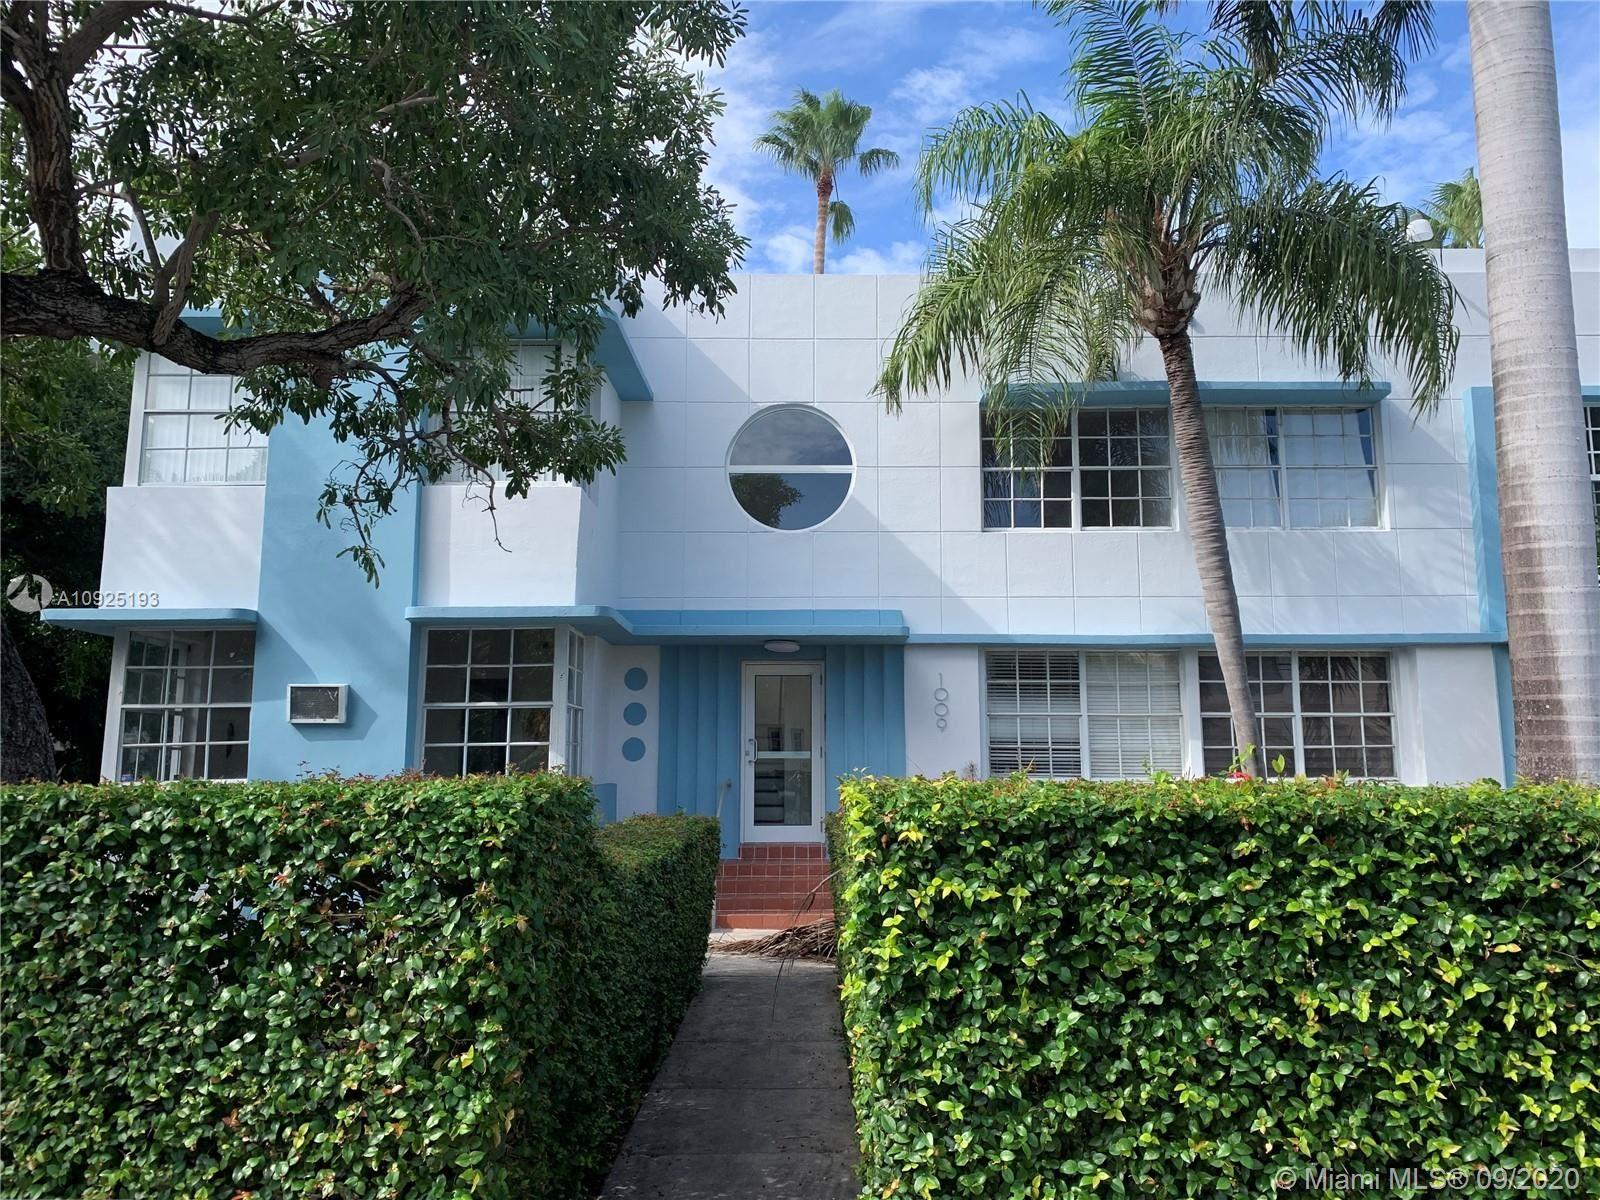 1009 Meridian Ave #13, Miami Beach, FL 33139 - #: A10925193